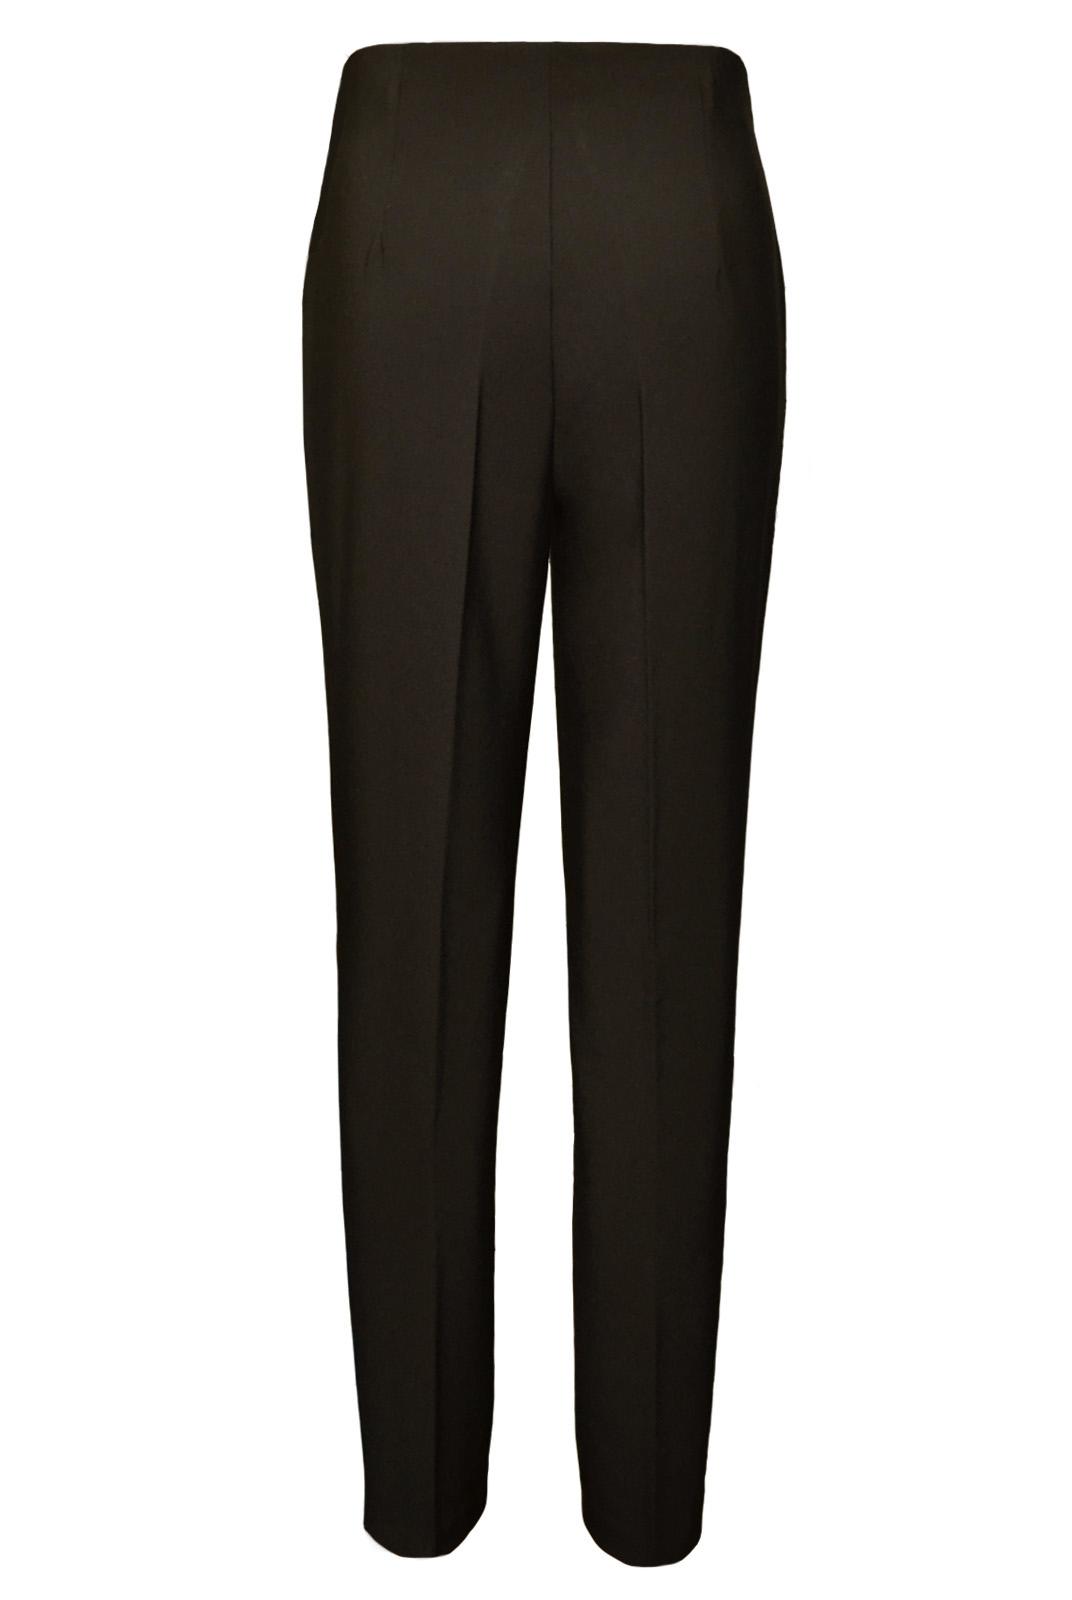 Юбки брюки модели доставка